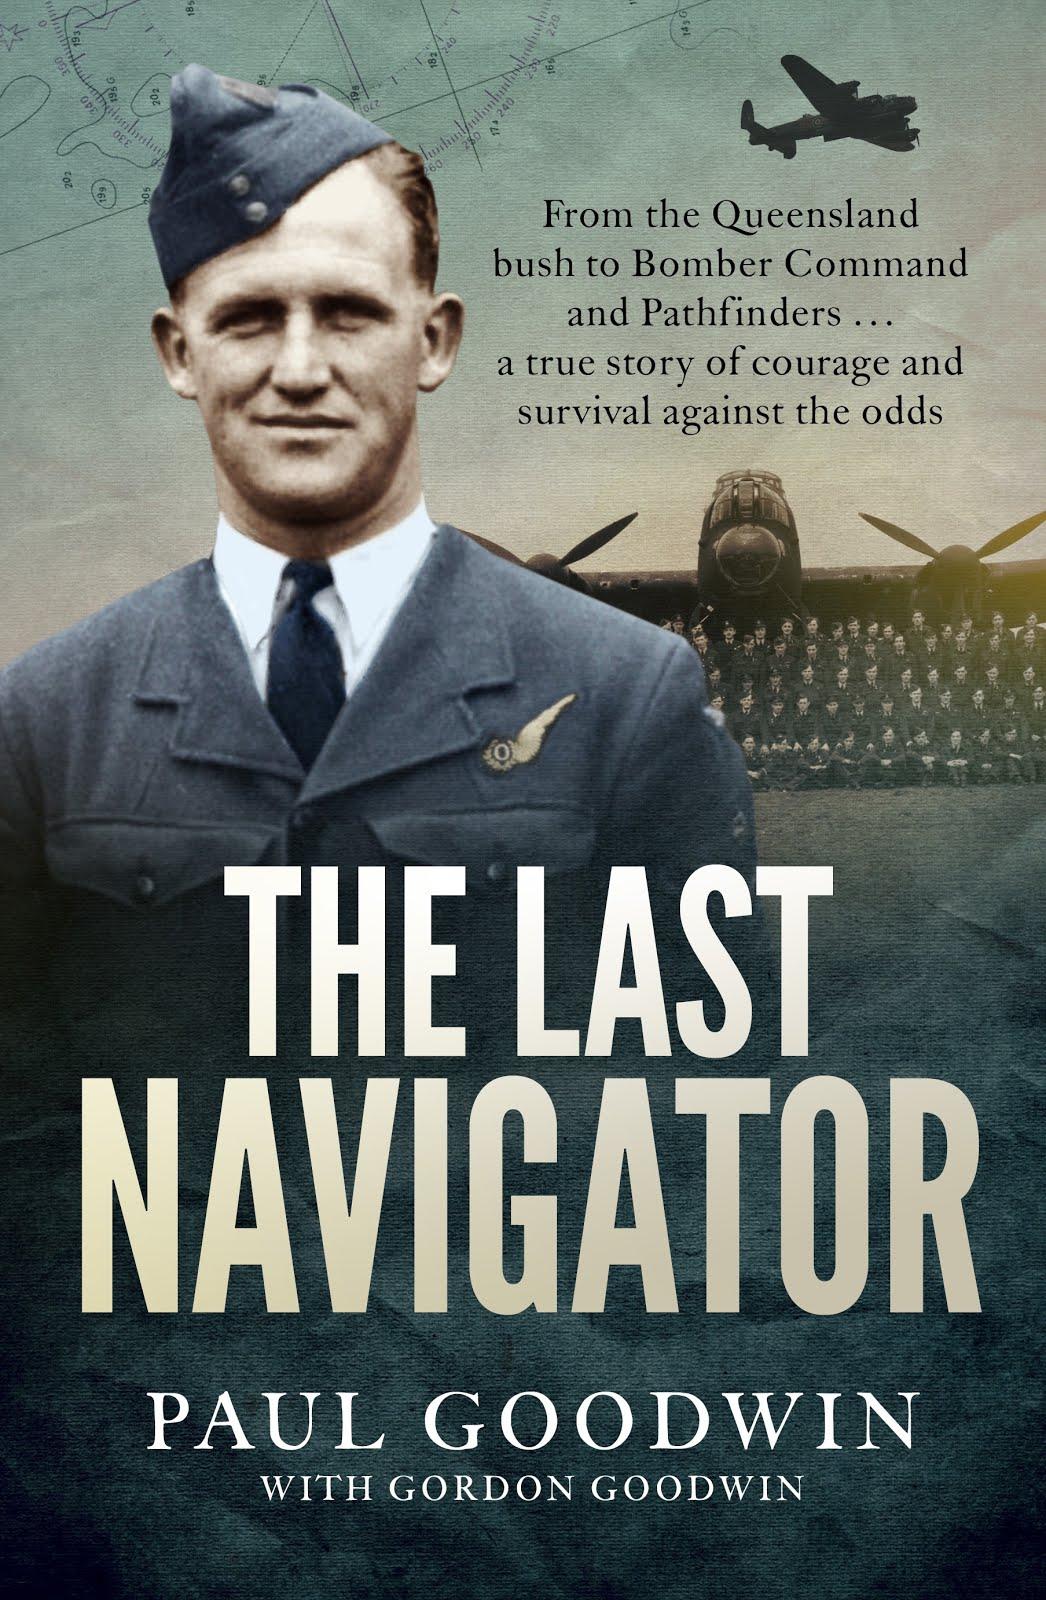 The Last Navigator